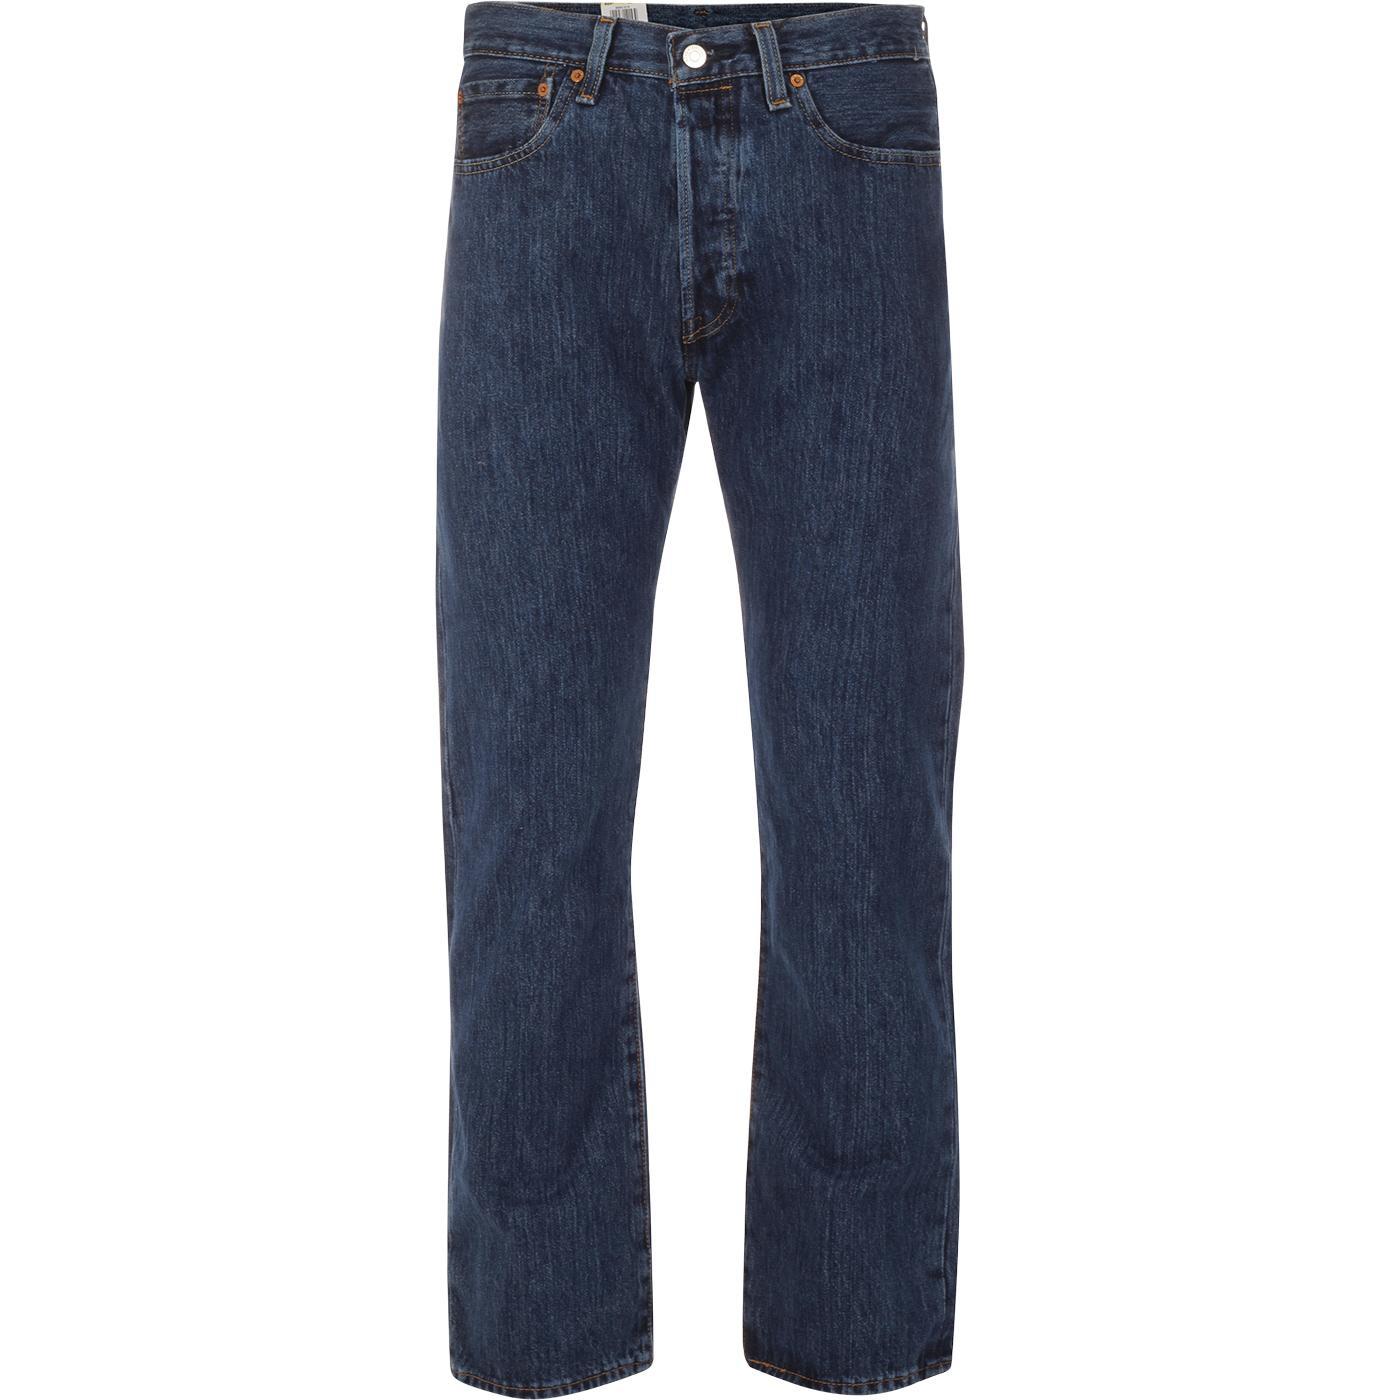 LEVI'S 501 Original Straight Leg Jeans (Stonewash)